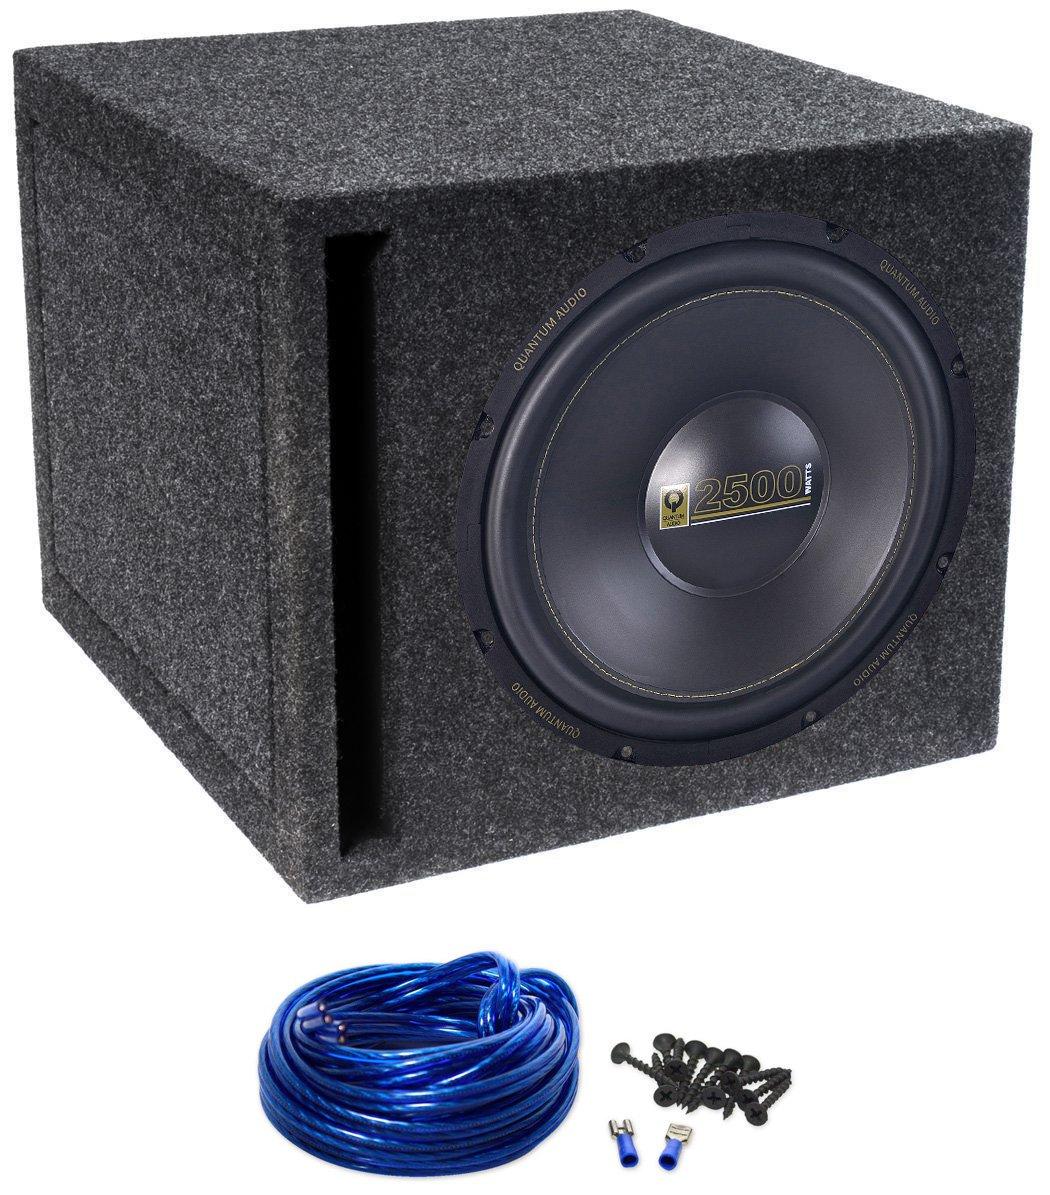 Quantum Audio Qaw15d2 15 2500 Watt Car Subwoofer Vented Sub Box Wiring Diagram Enclosure Electronics